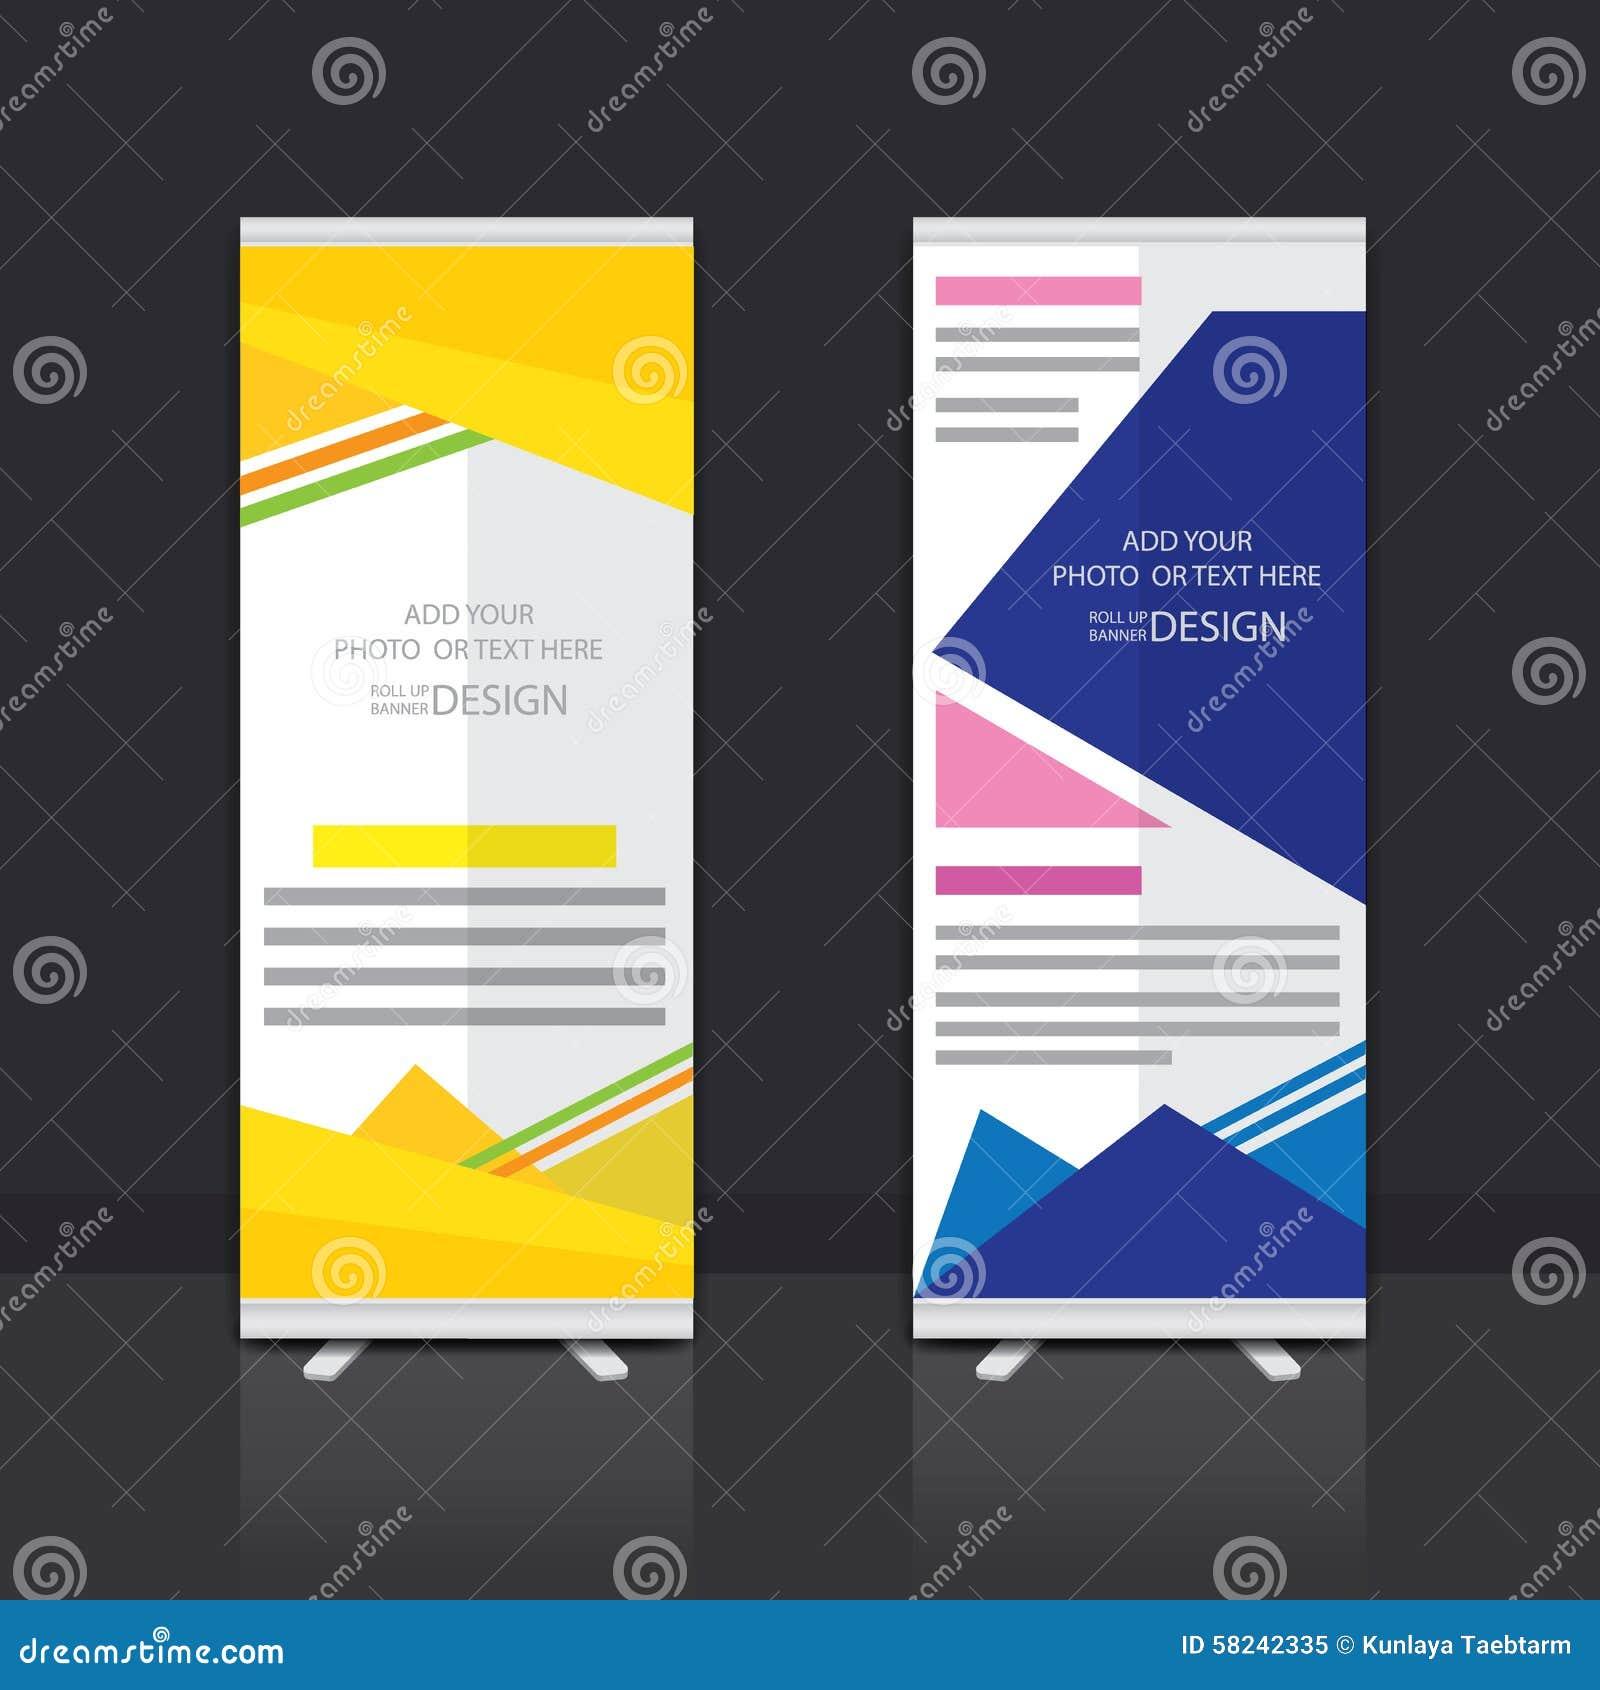 Design for roll up banner - Banner Design Roll